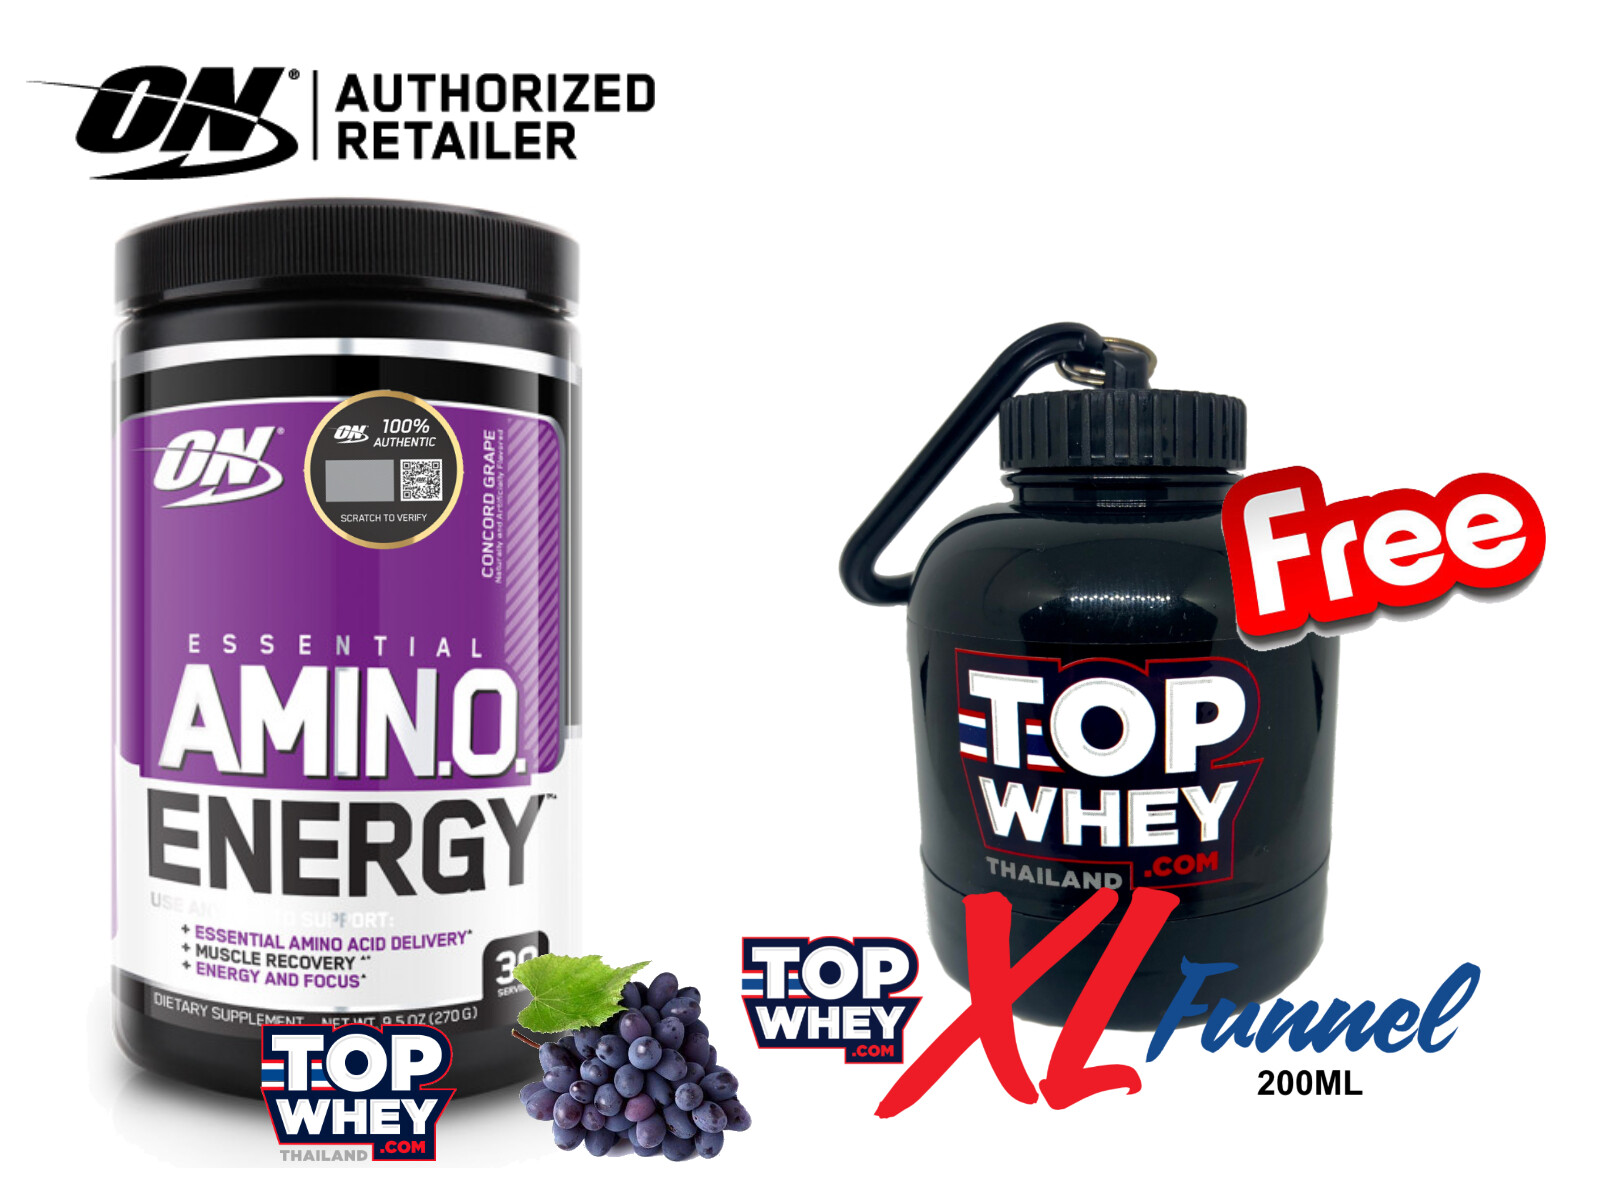 Optimum Nutrition Amino Energy 30 Servings - Concord Grape – กรดอะมิโน ช่วยให้ร่างกายตื่นตัวสดชื่น กล้ามเนื้อฟื้นตัวได้ไวขึ้น ป้องกันการทำลายกล้ามเนื้อและกระตุ้นการสังเคราะห์โปรตีนเพื่อสร้างกล้ามเนื้อ